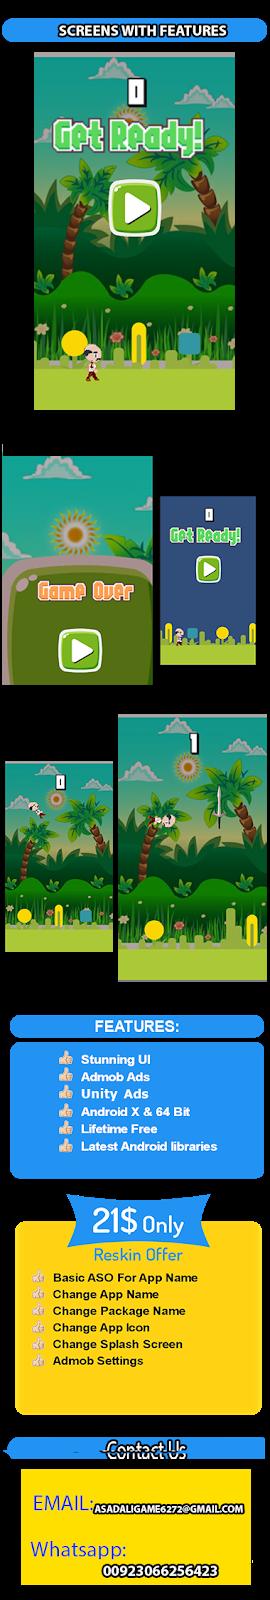 Flappy Bird Like Master jump game(Admob + Unity) - 1